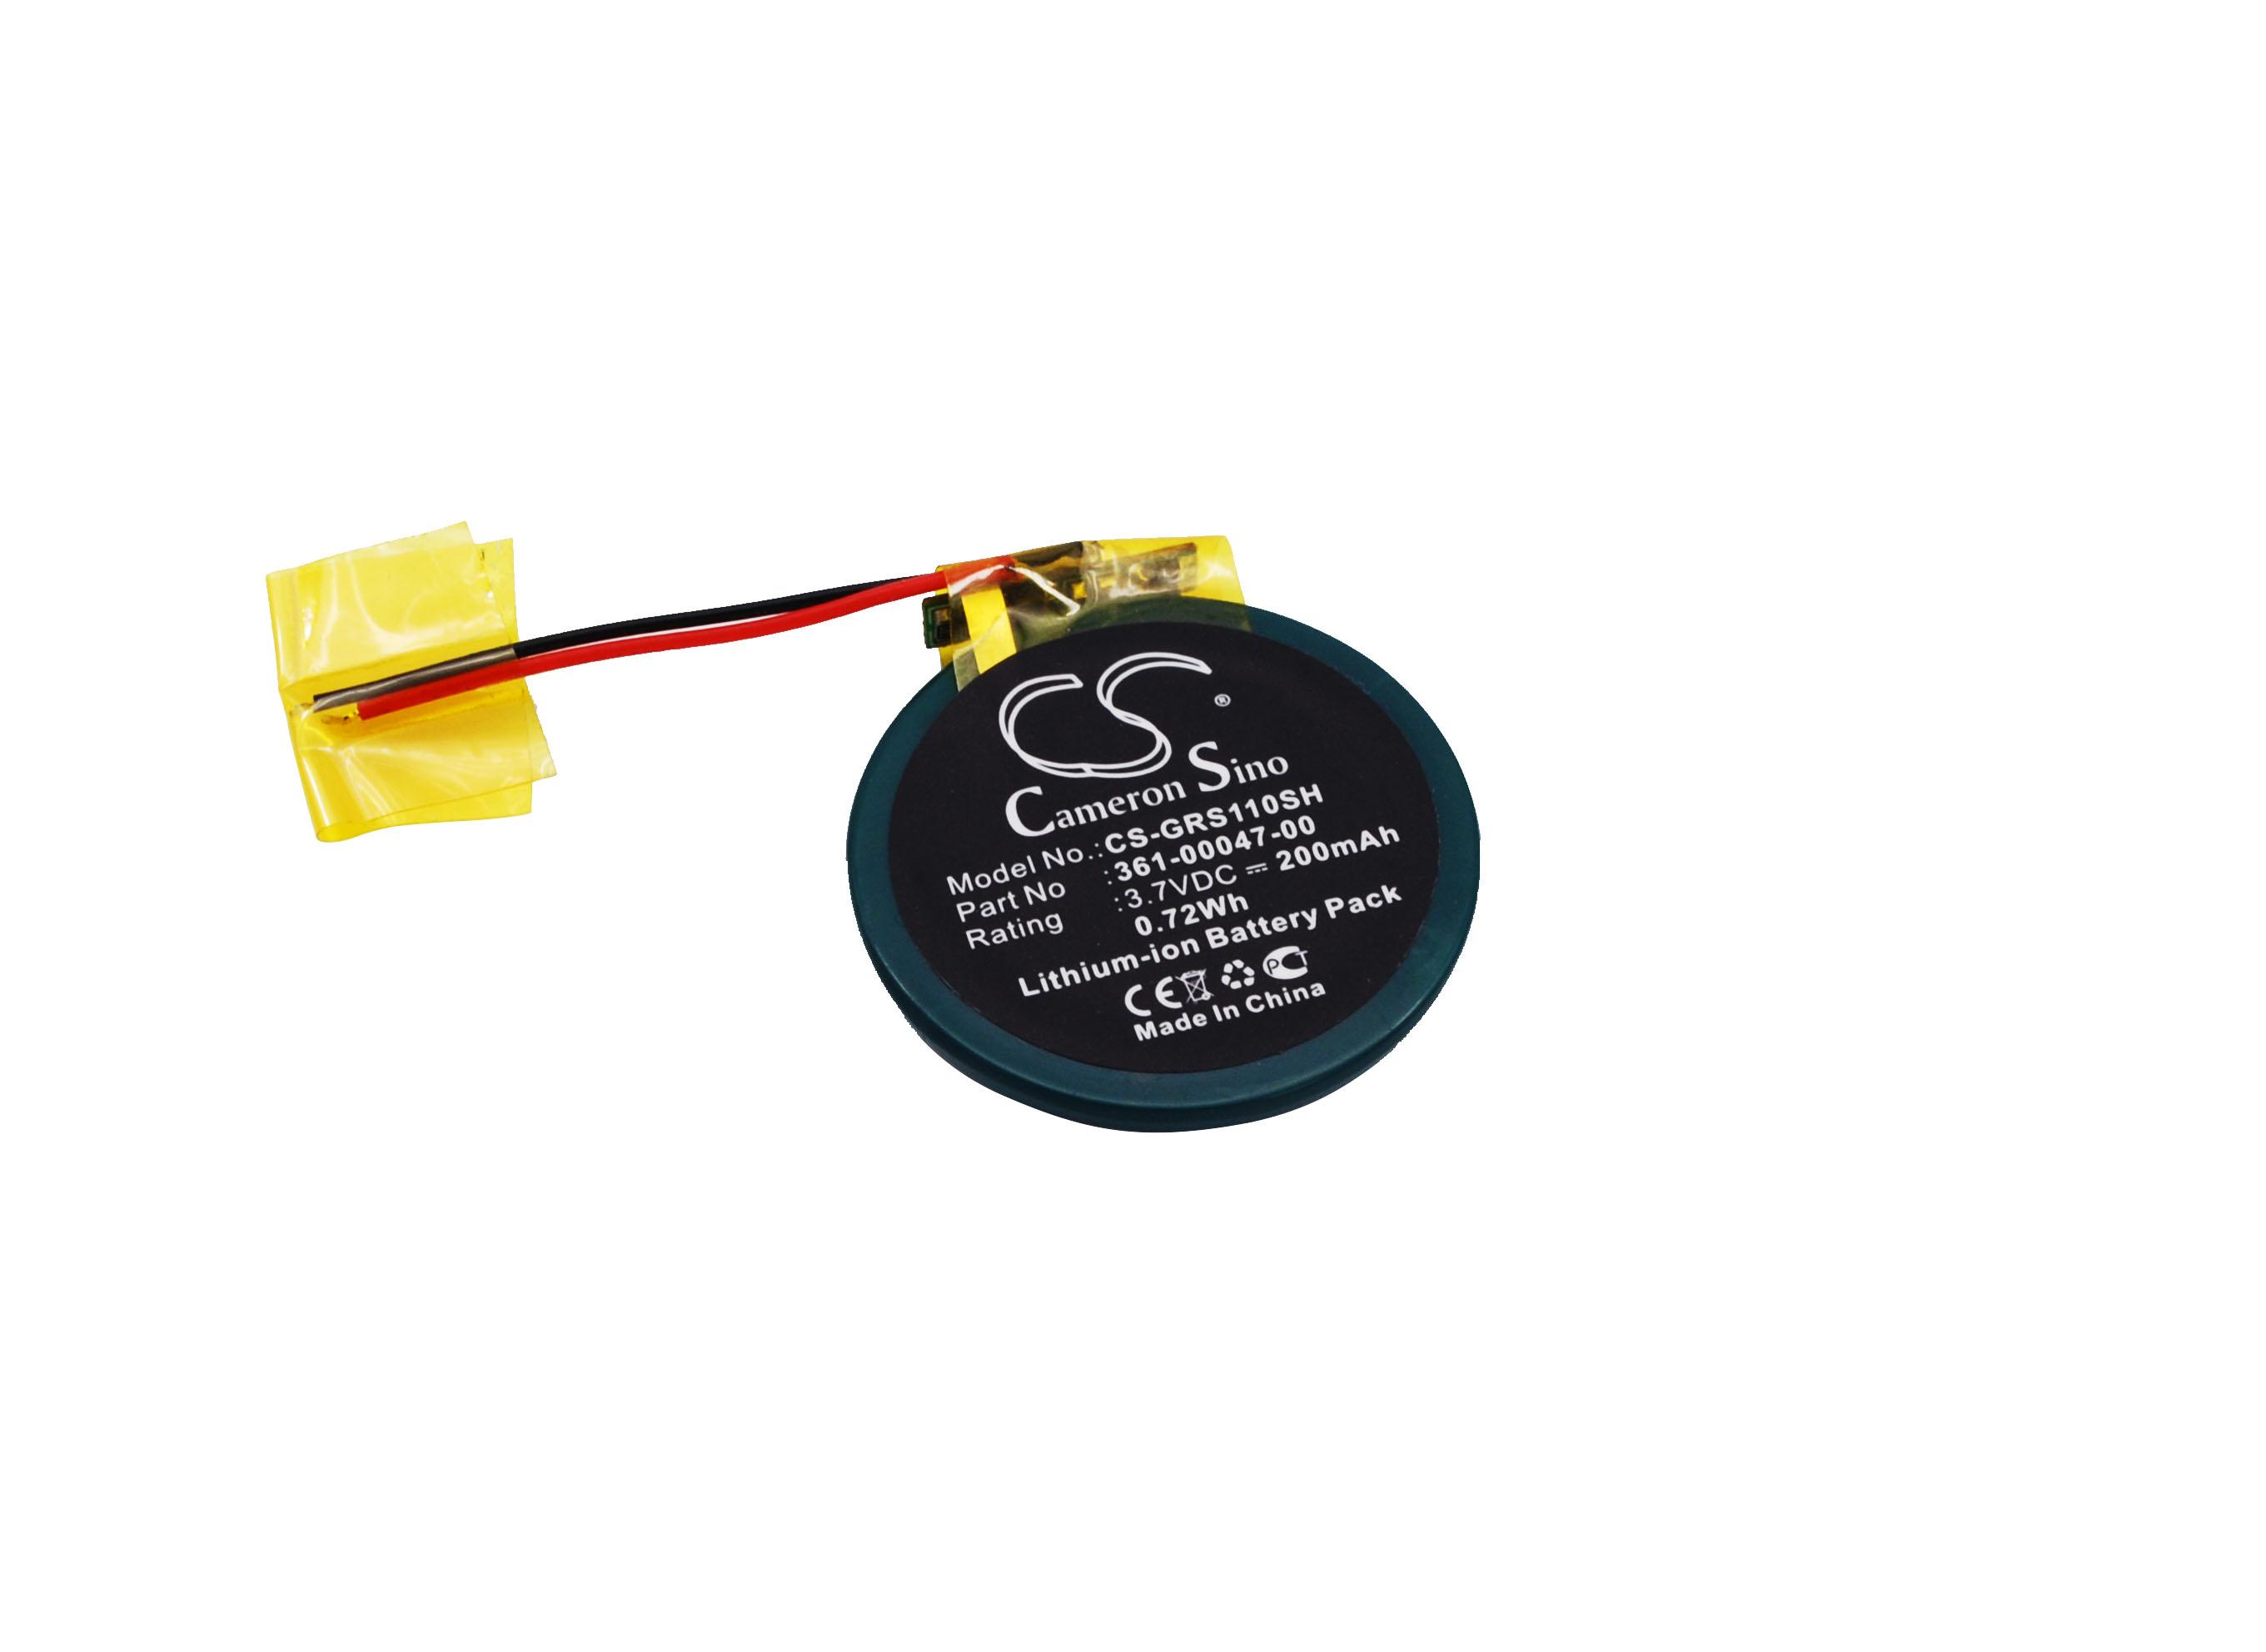 Cameron Sino baterie do chytrých hodinek pro GARMIN Approach S1 3.7V Li-ion 200mAh černá - neoriginální